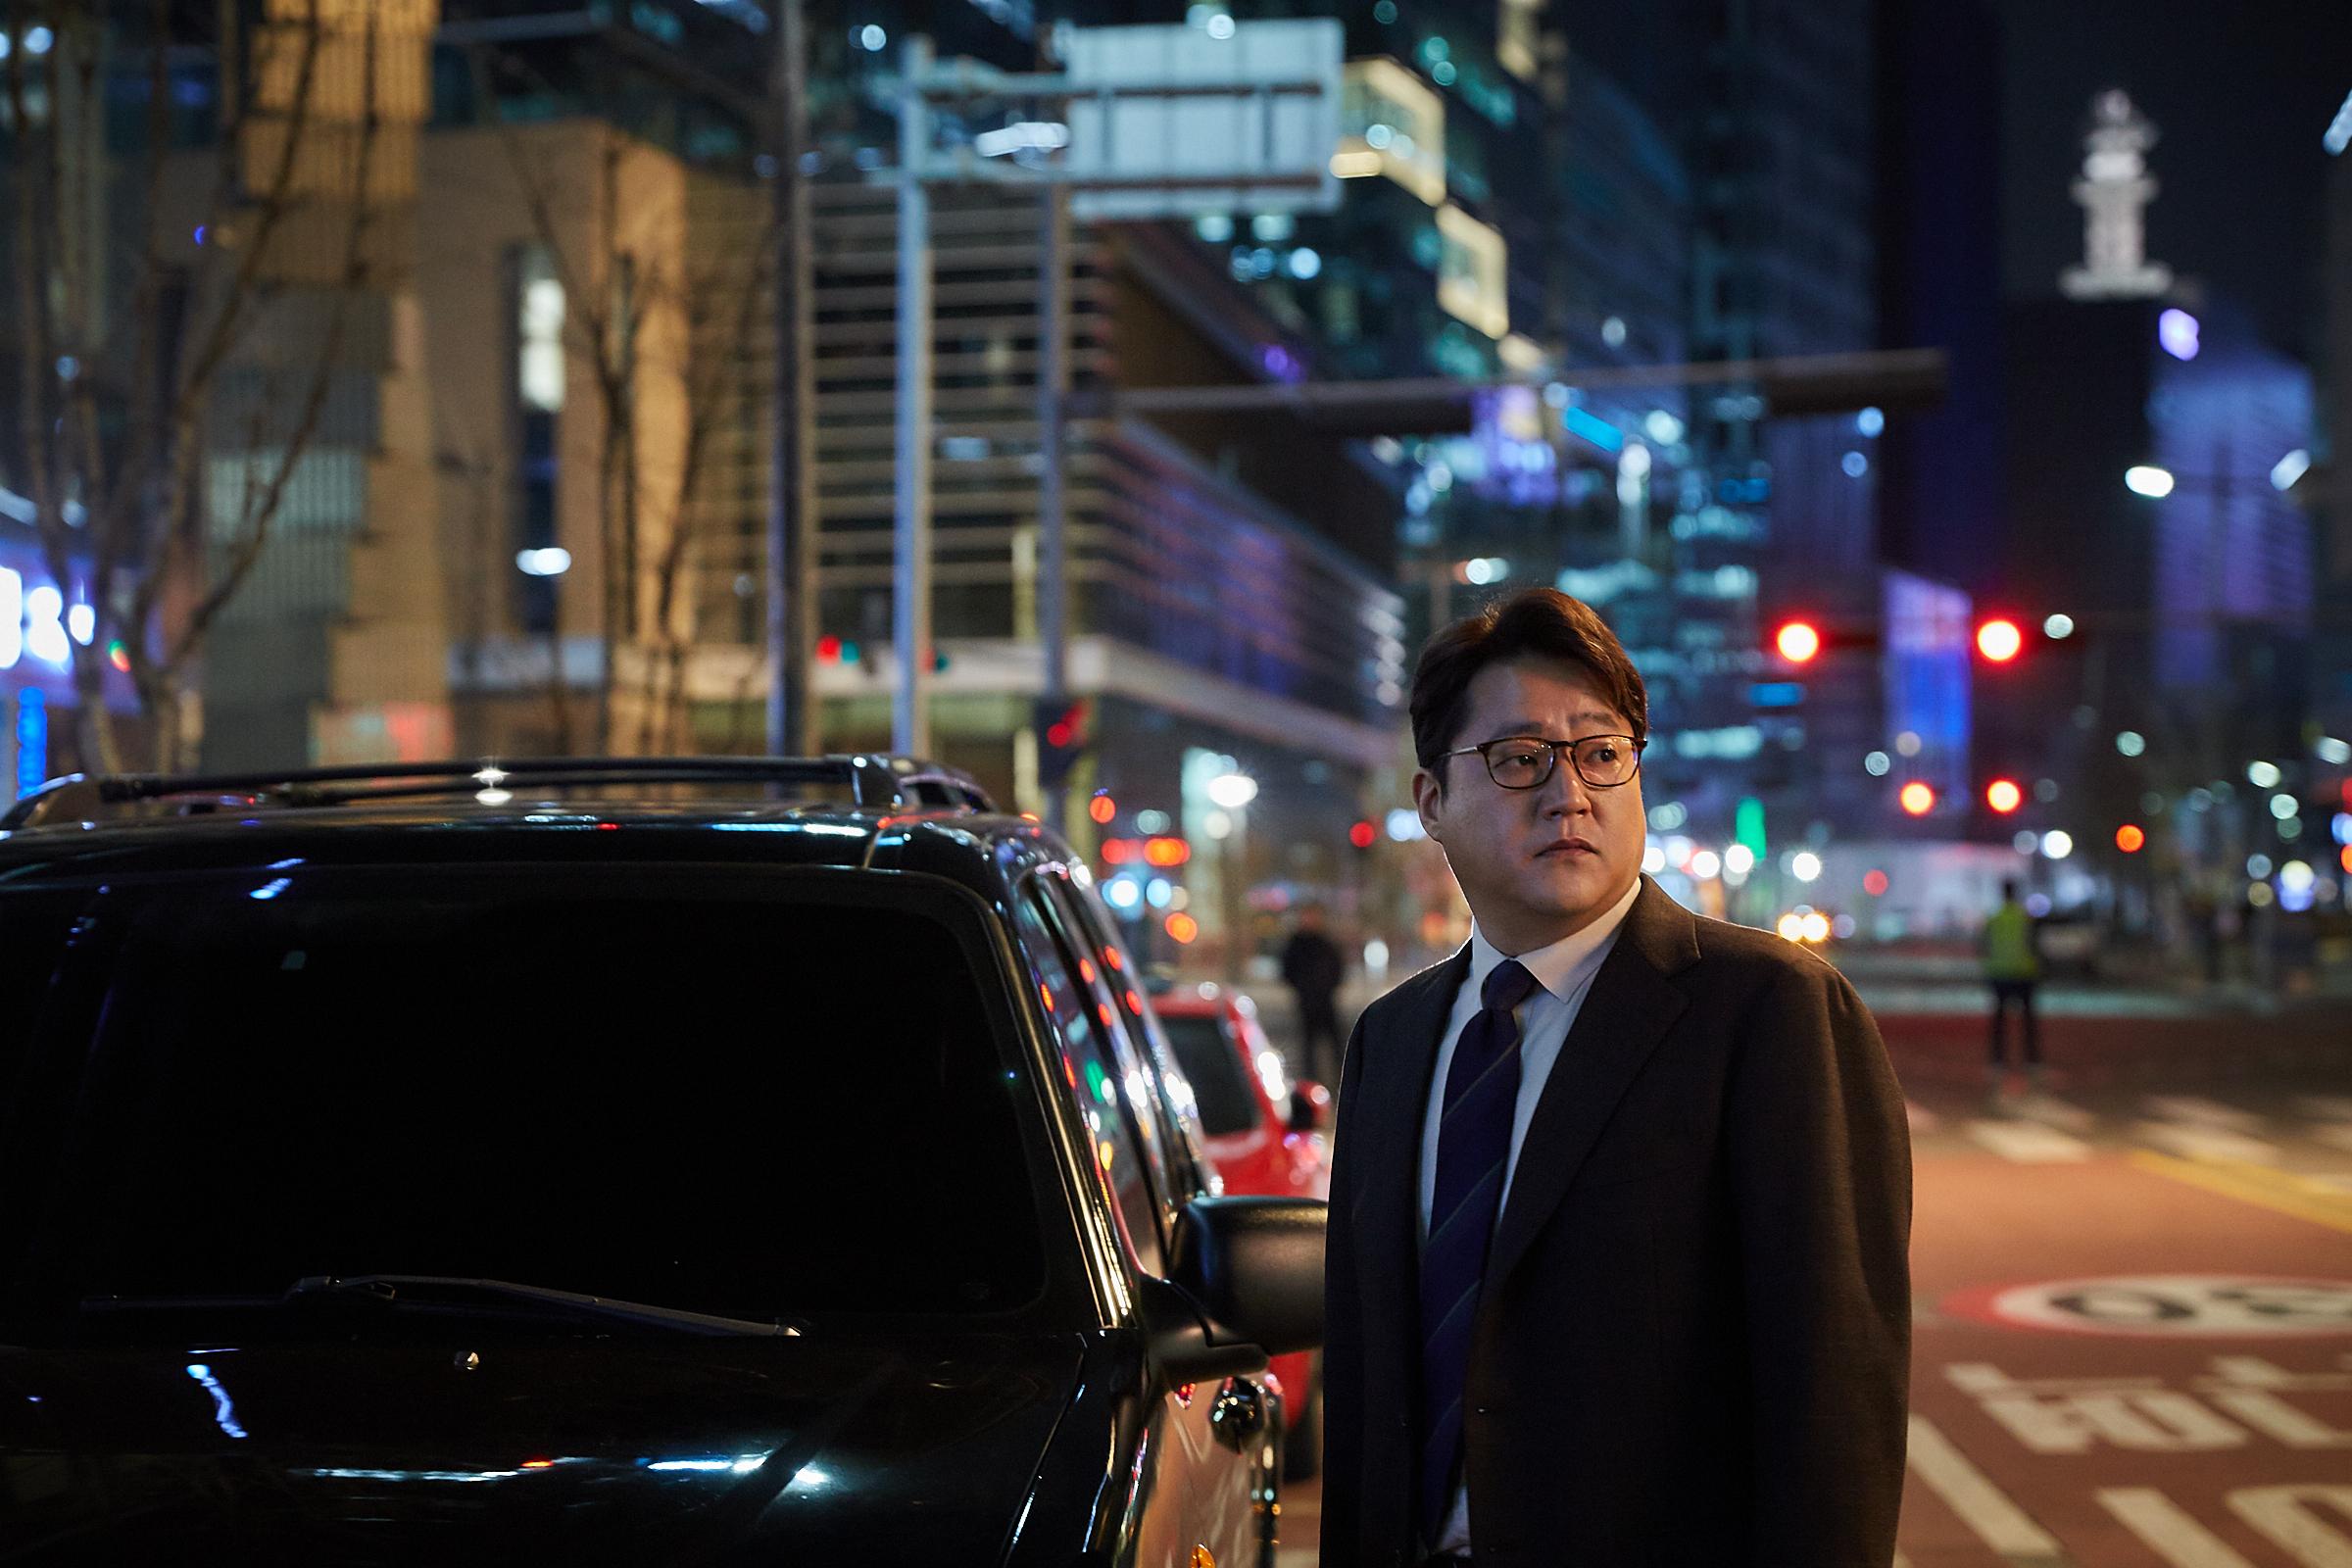 Netflixオリジナル映画 『鋼鉄の雨』 1枚目